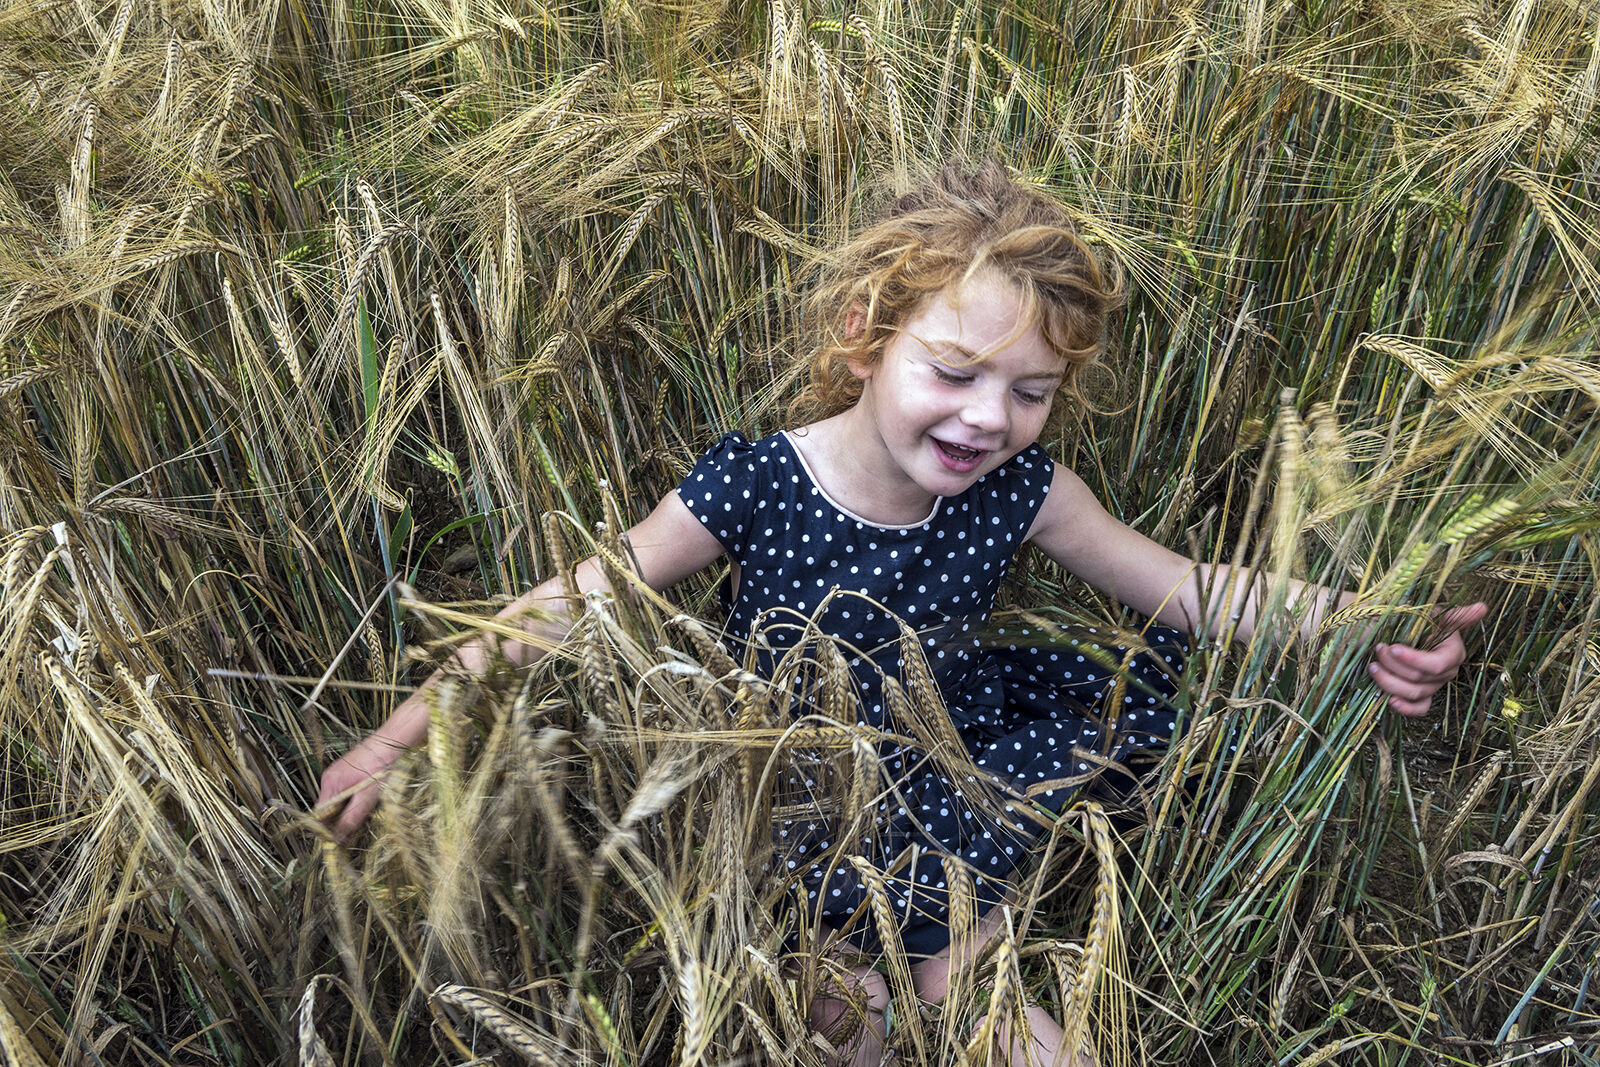 Maggie in Wheat Field, Tipperary, Ireland 2020